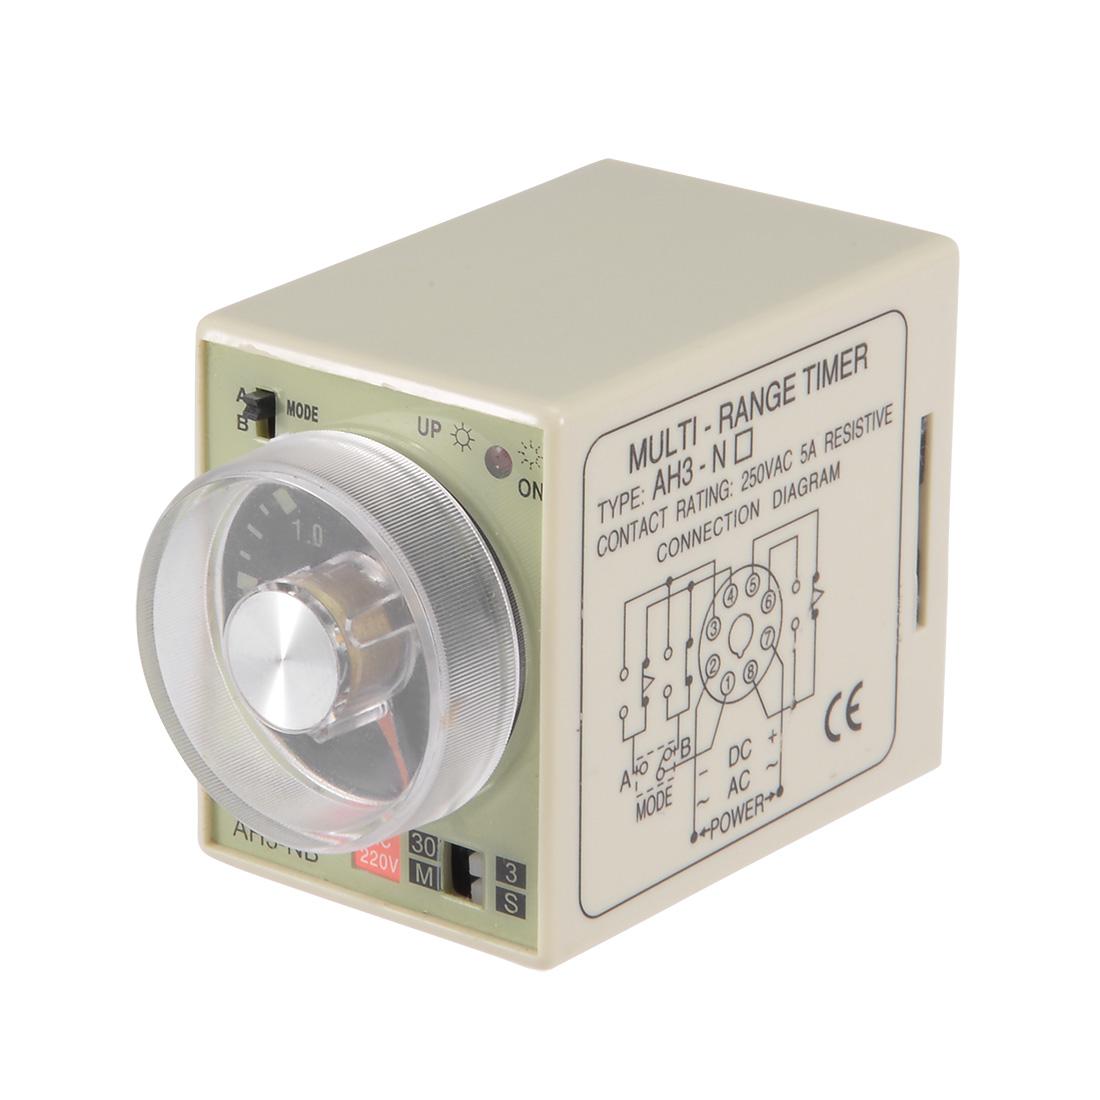 AC220V 3S-30M 8 Terminals Range Adjustable Delay Timer Time Relay AH3-NB